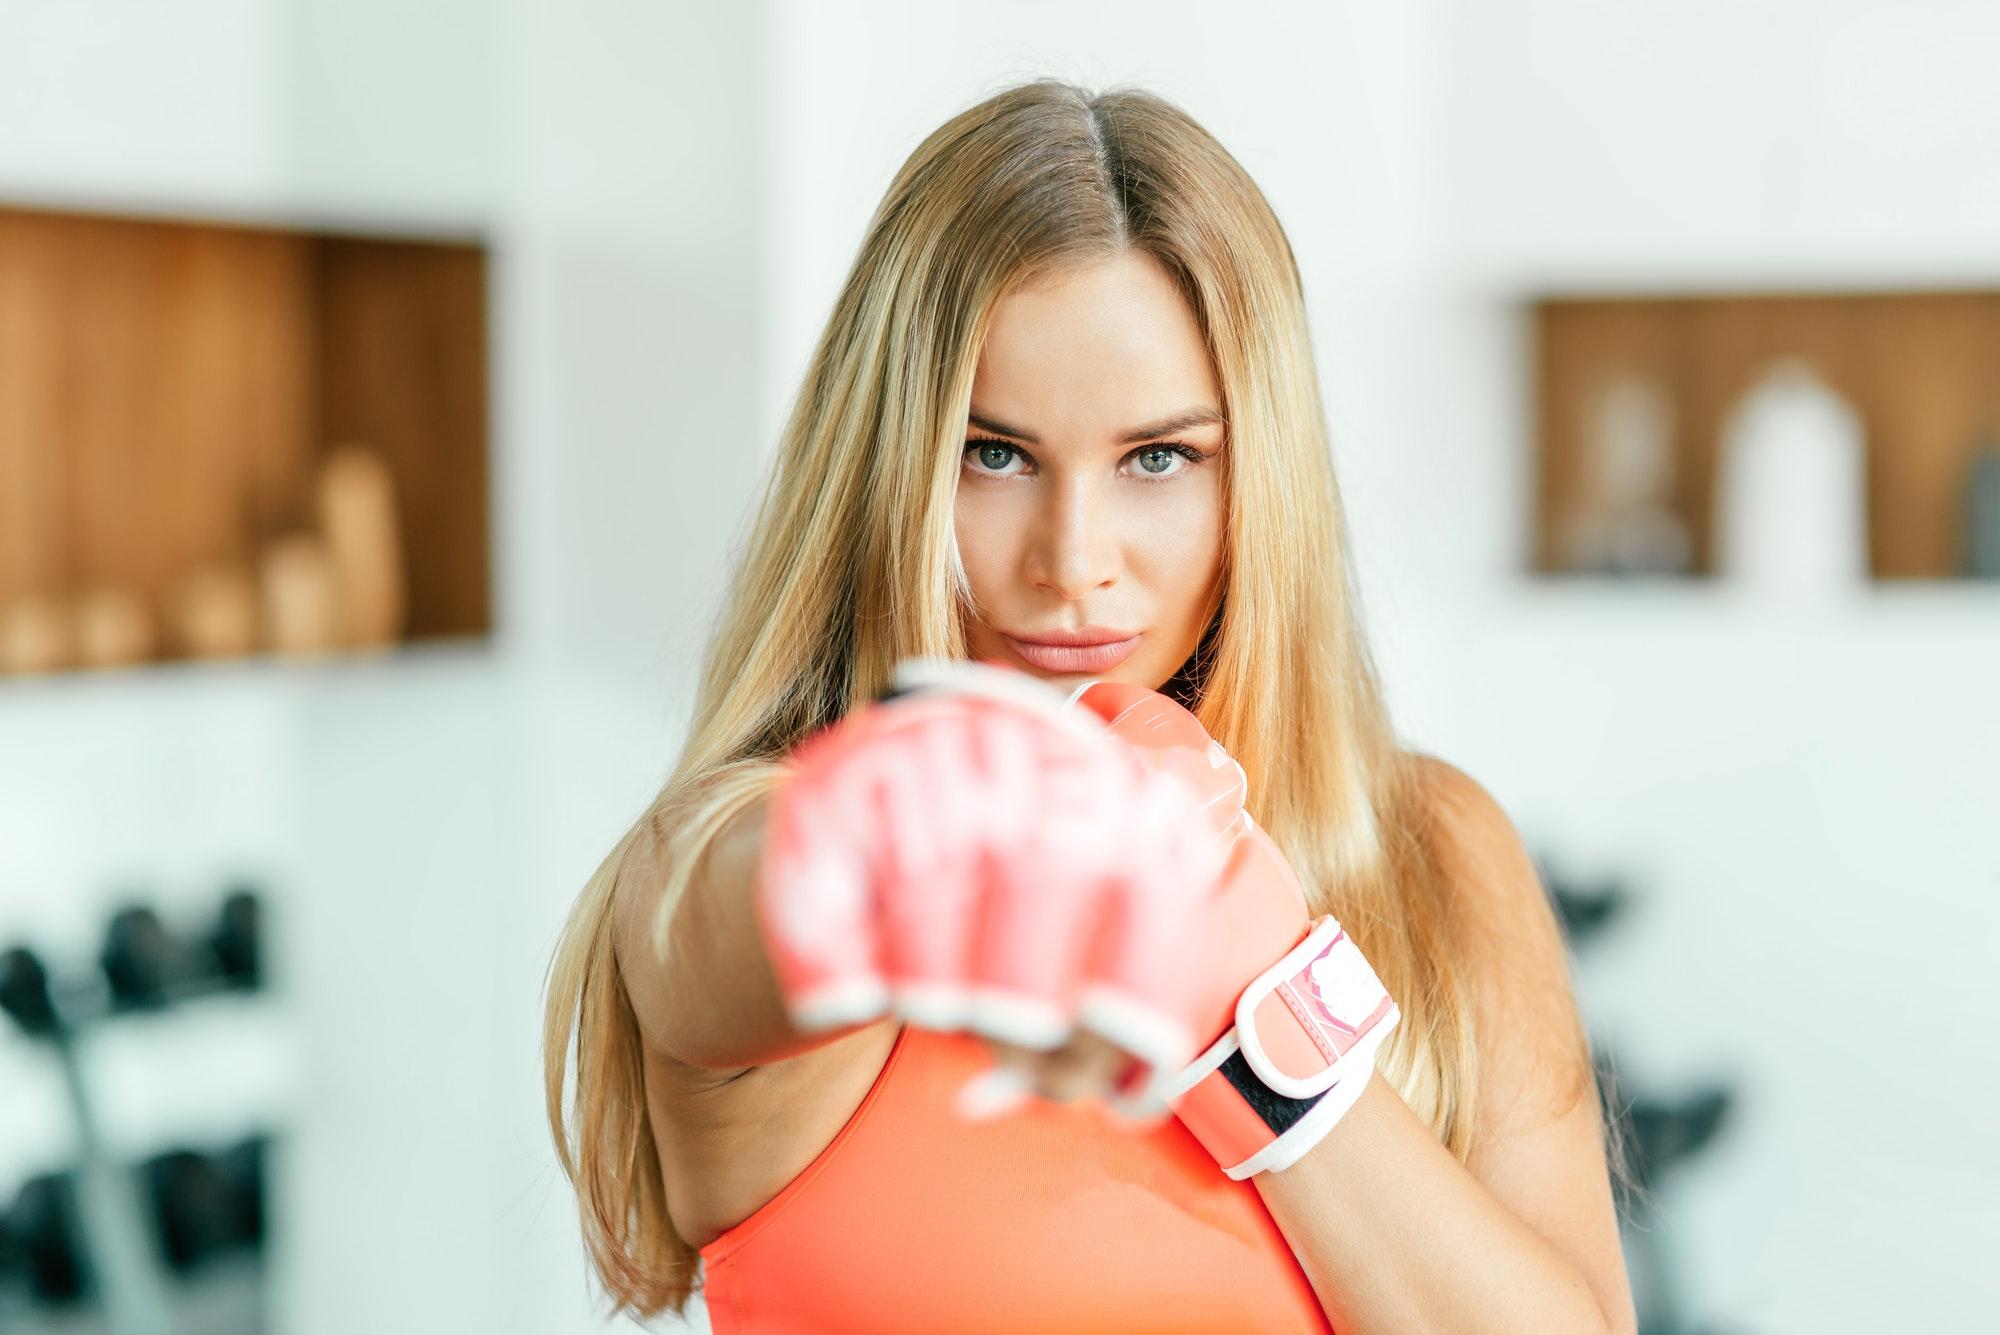 Dangerous girl. Sportswoman working out in gym.